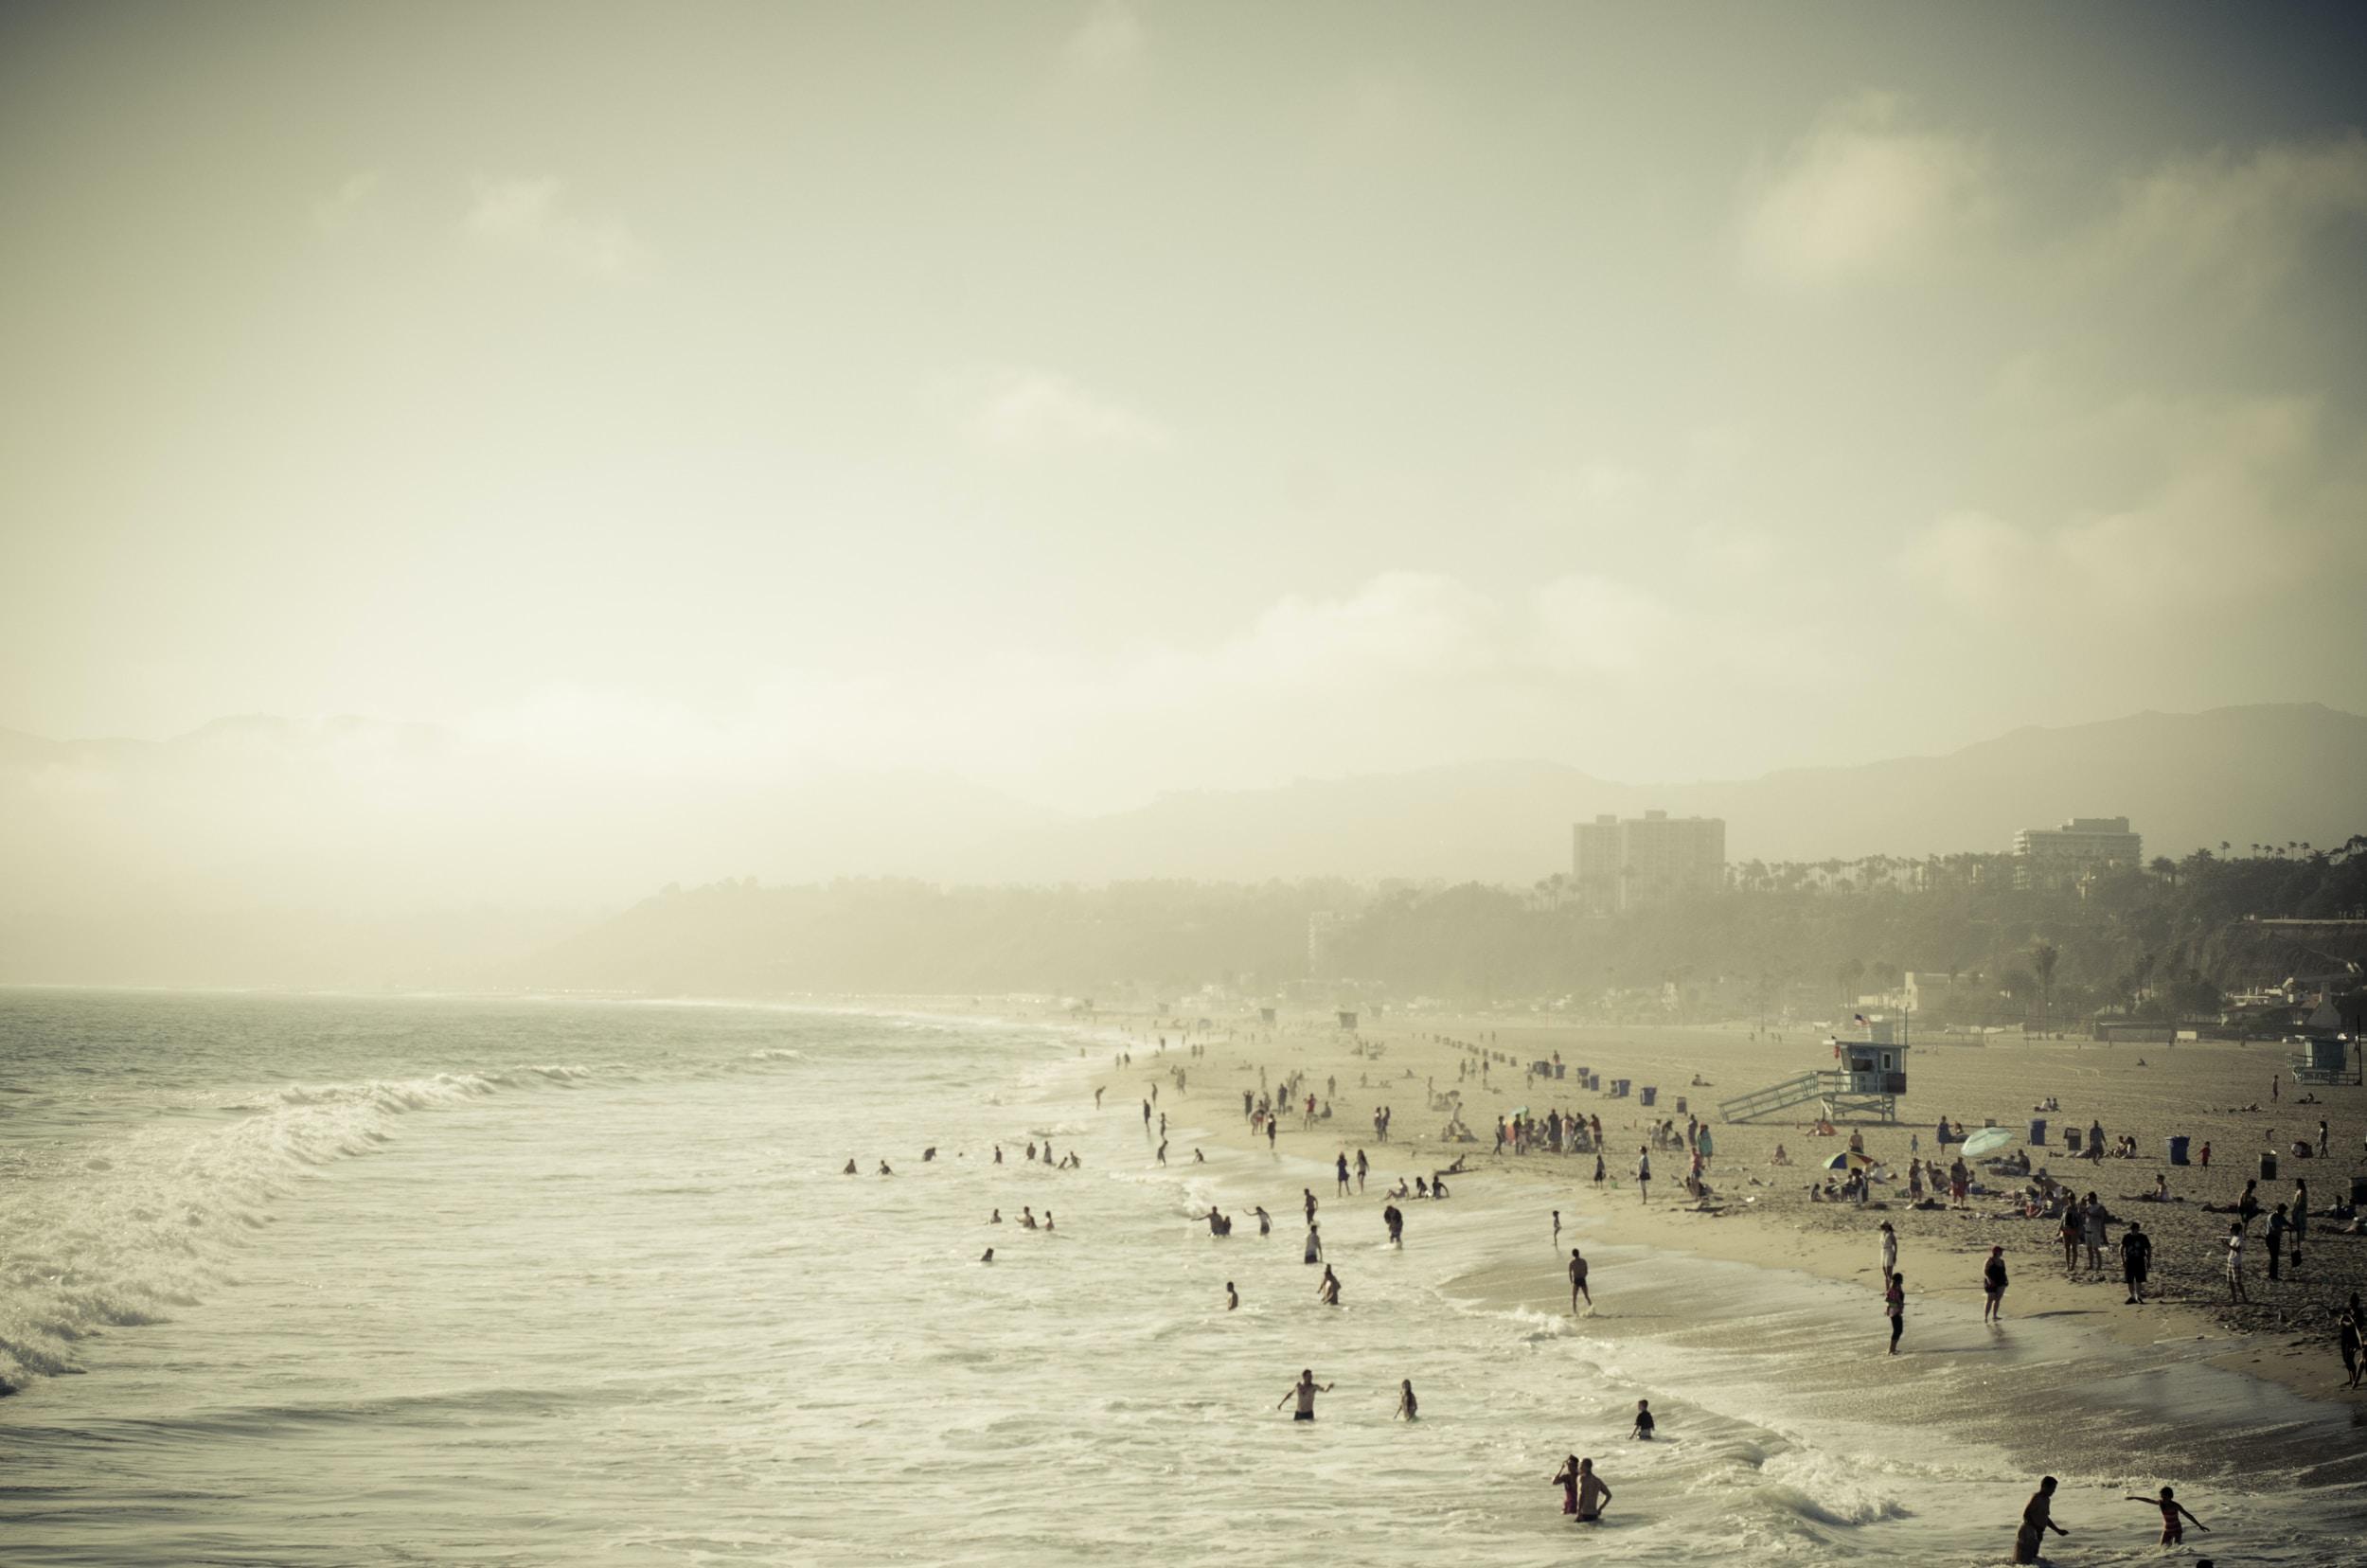 Crowded Santa Monica sand beach